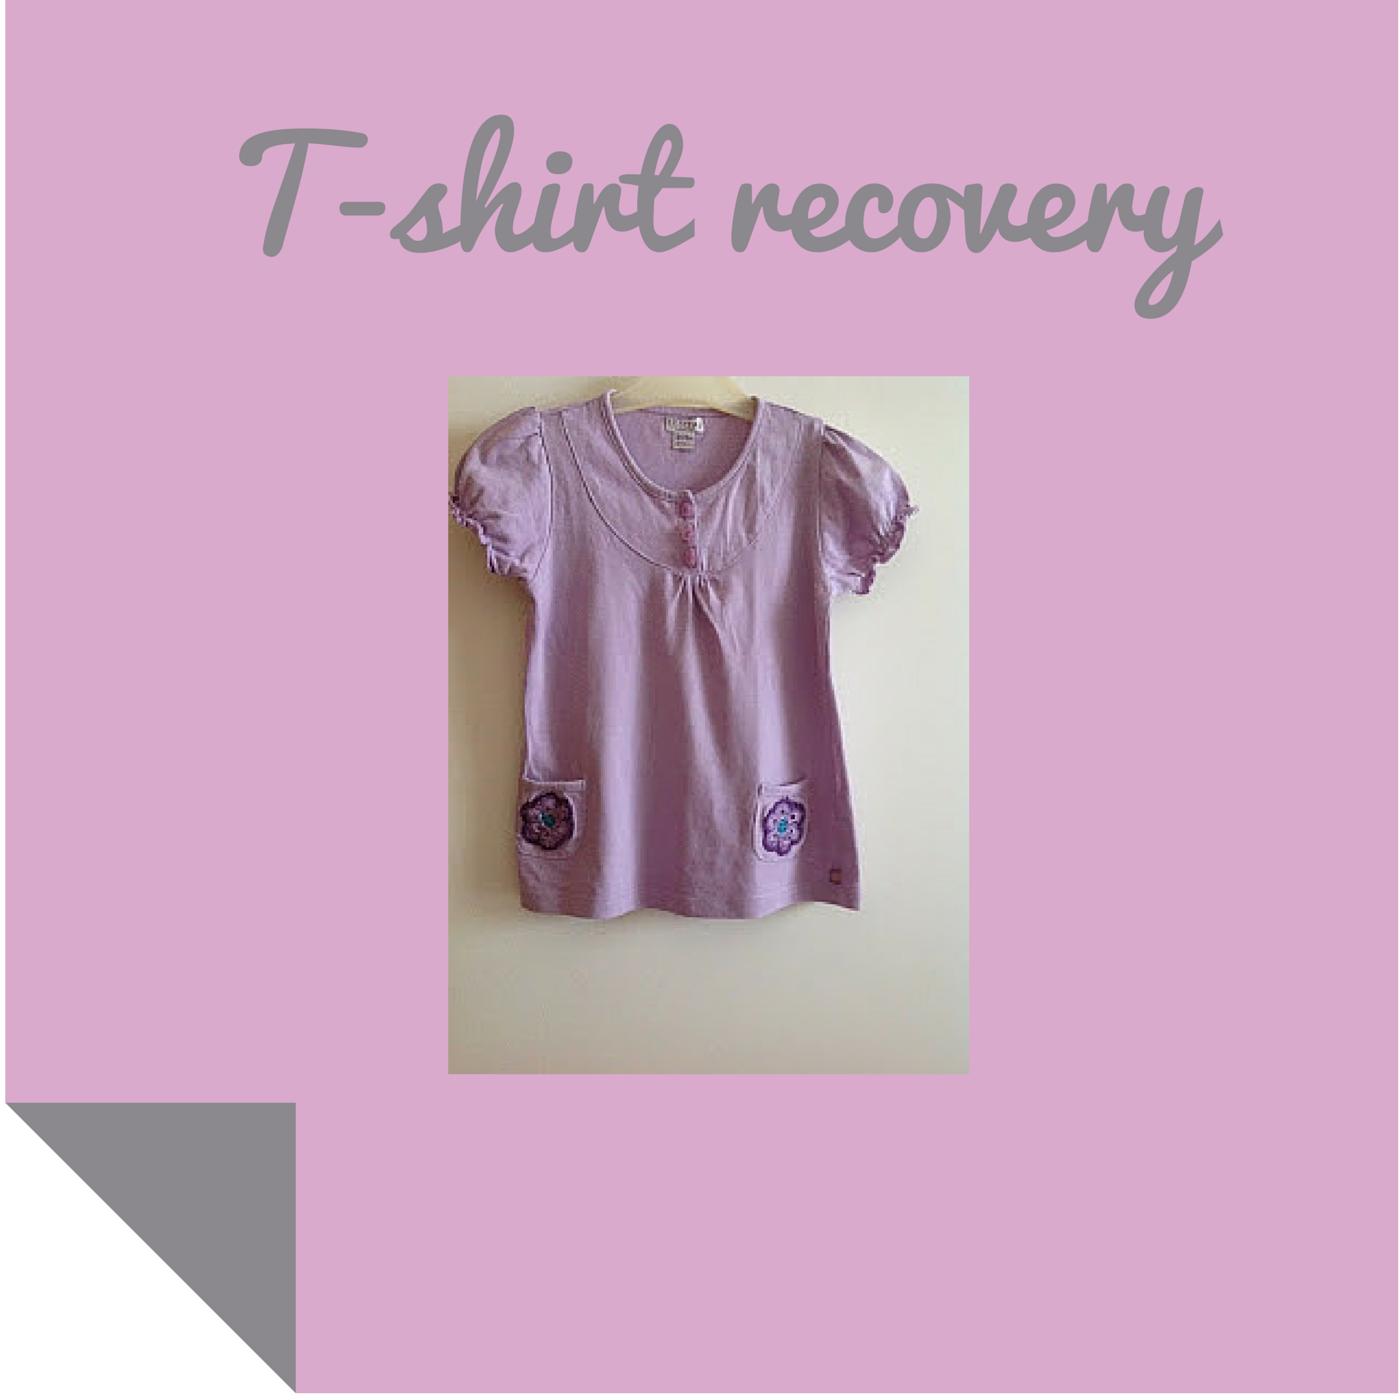 http://keepingitrreal.blogspot.com.es/2014/02/t-shirt-recovery.html